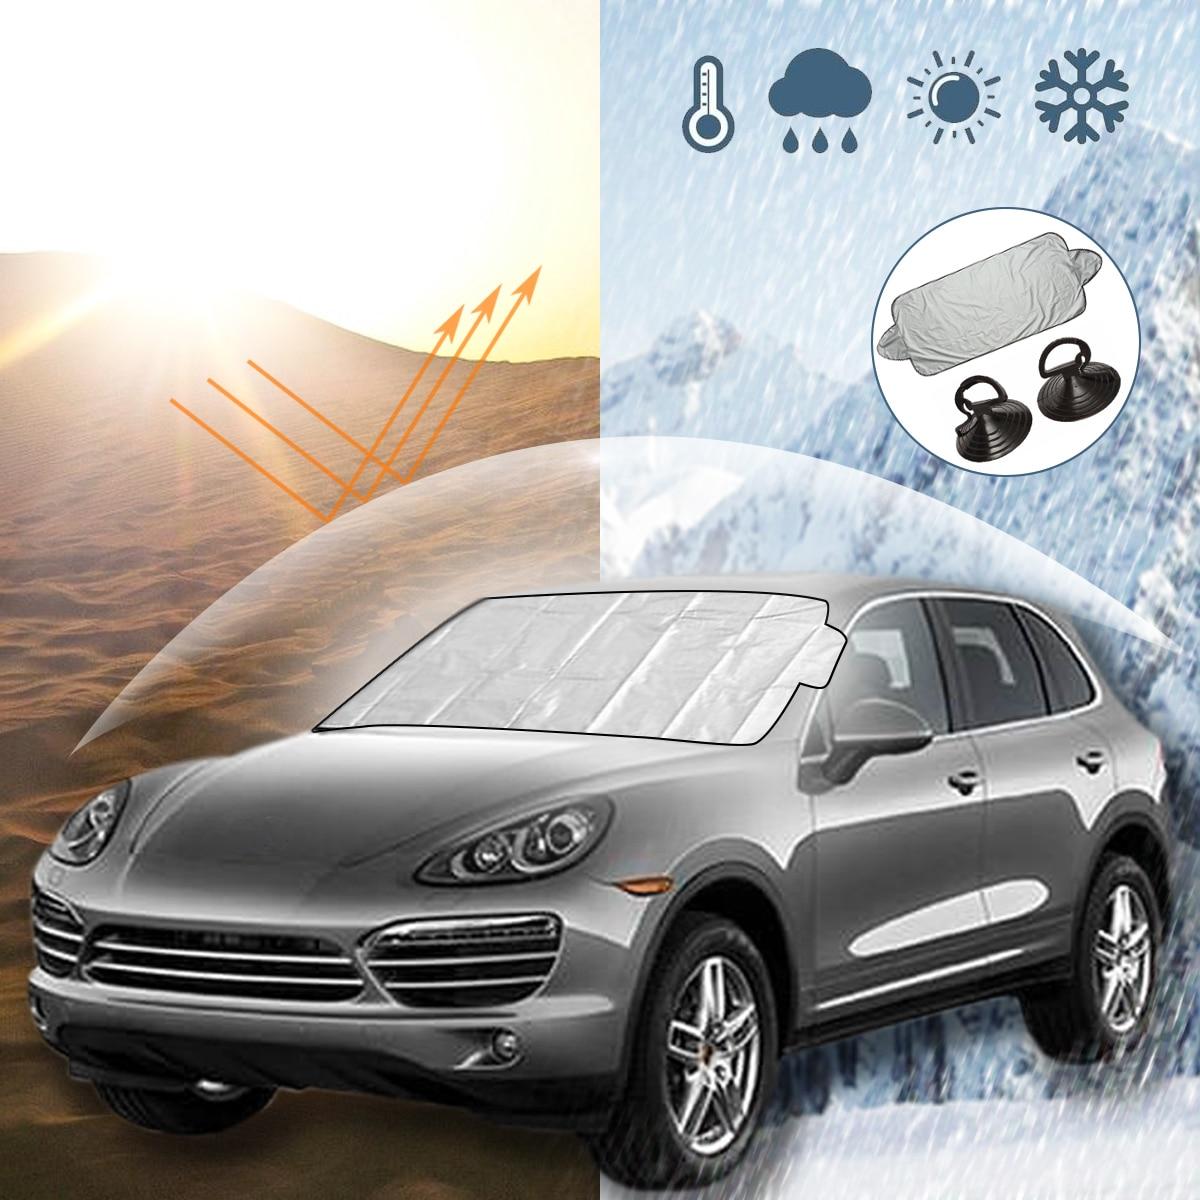 Universal Car Sunshade Cover Front Car Windscreen Cover Sun Shade Rain Ice Snow Protector Anti Sun UV Heat Protector